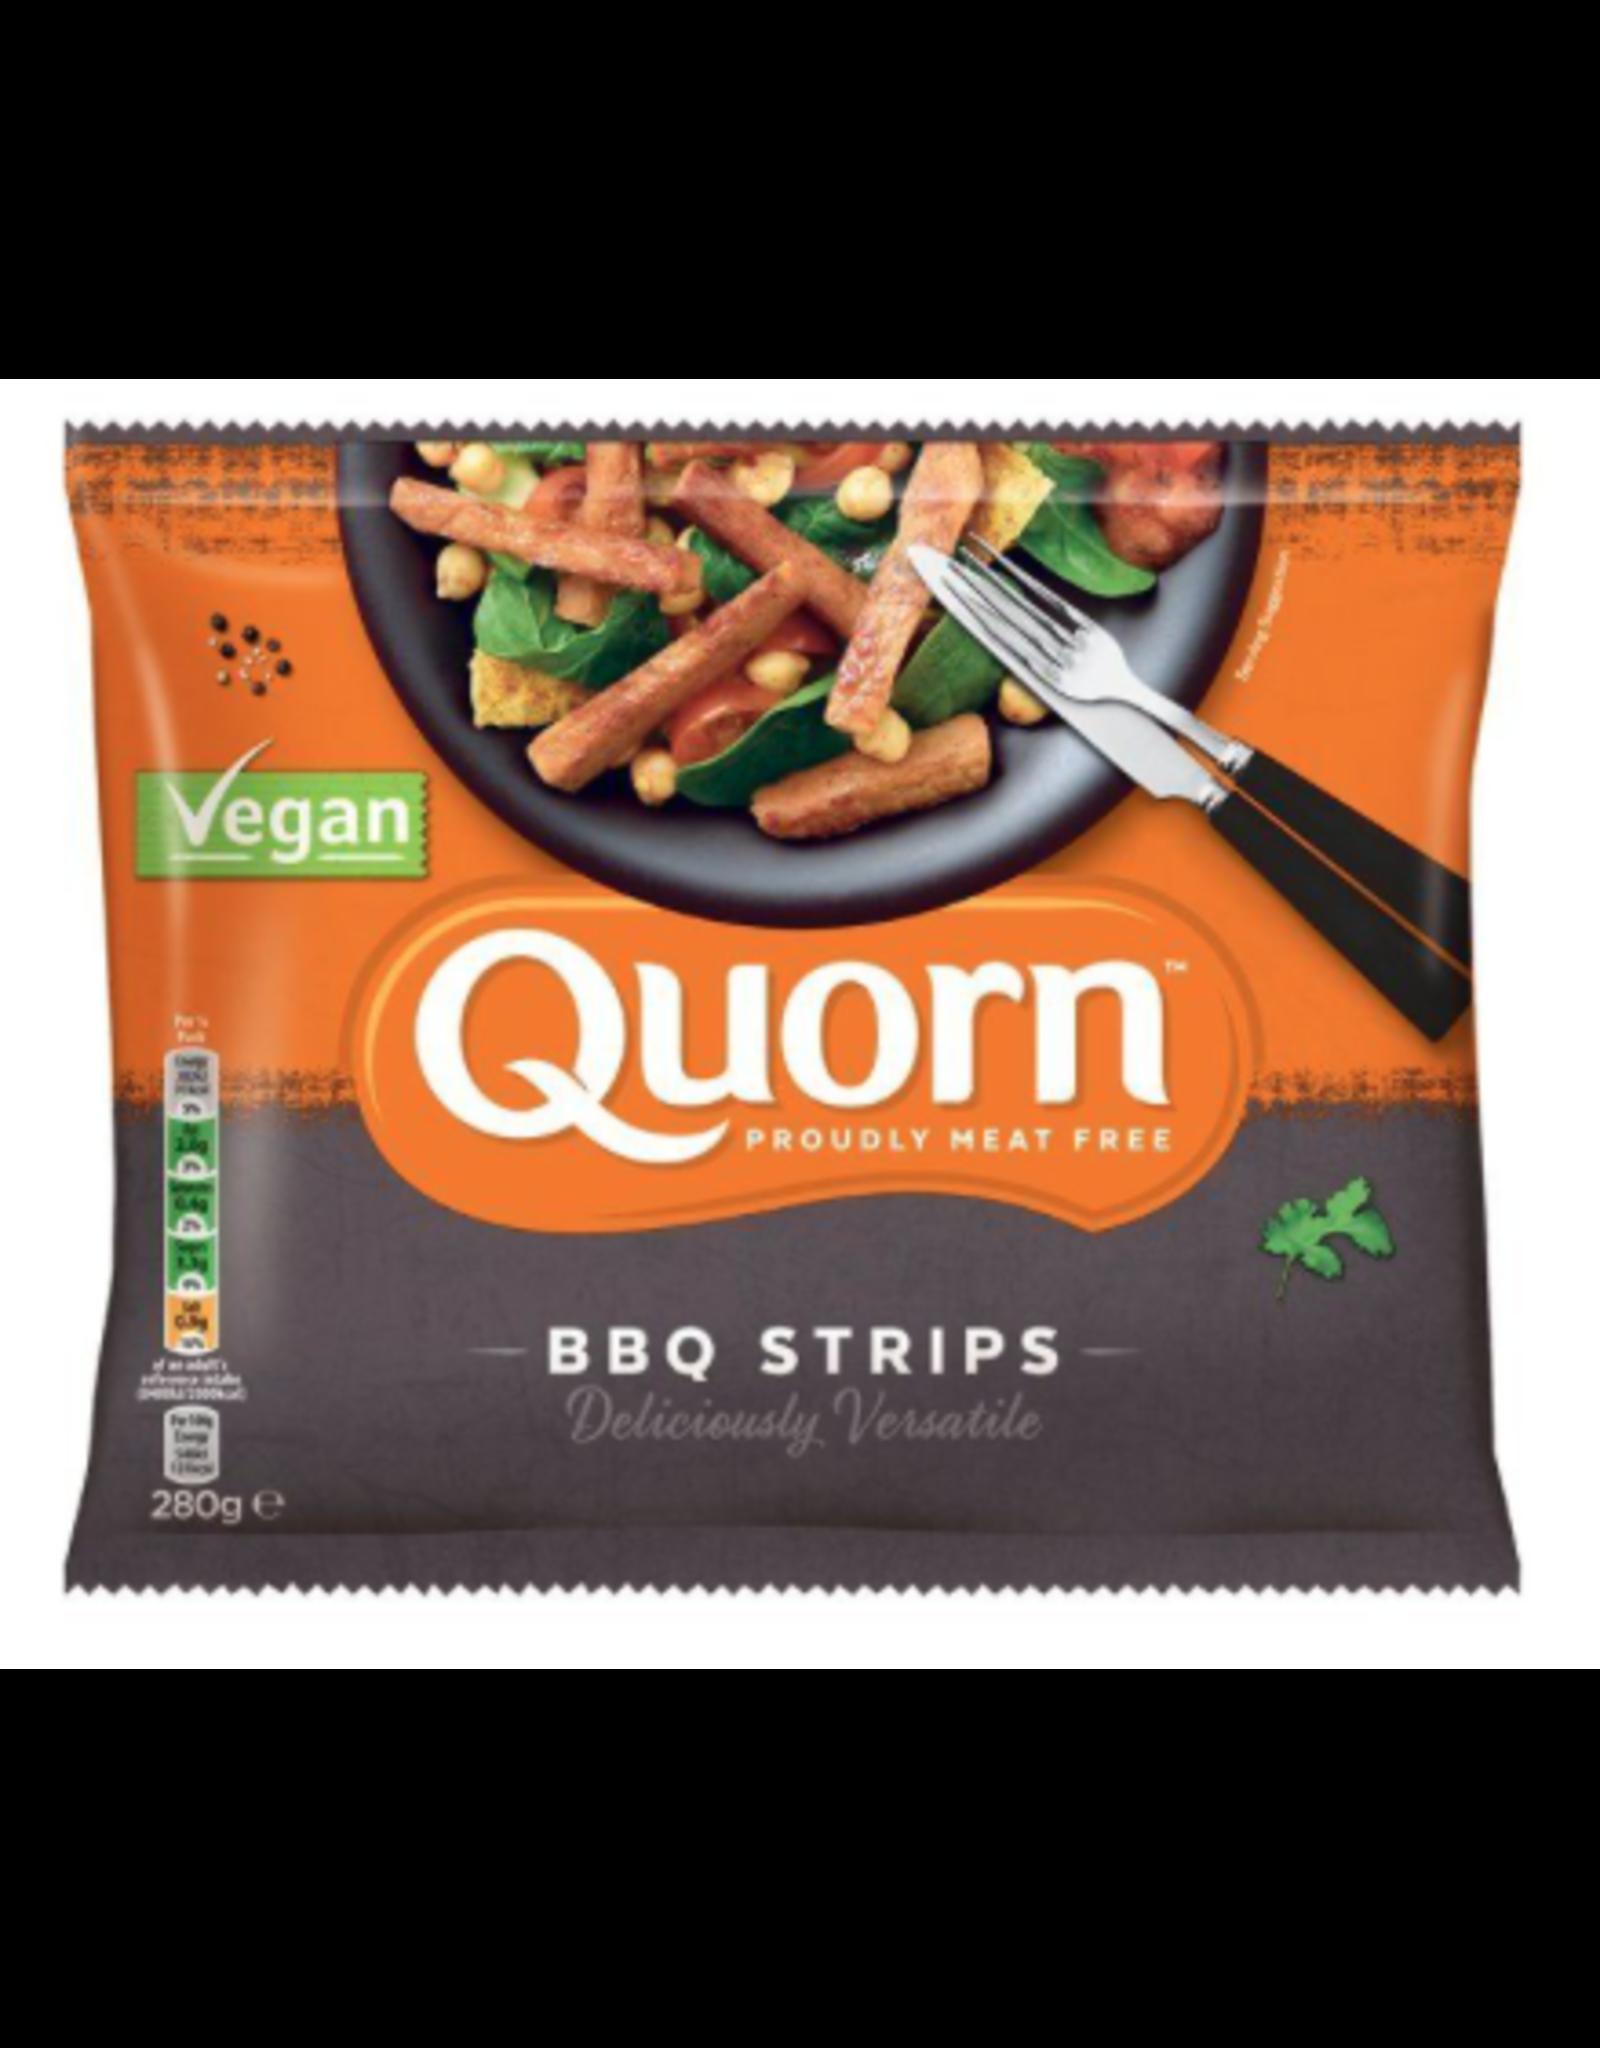 Quorn Vegane BBQ-Streifen, 280g  ❄️❄️❄️